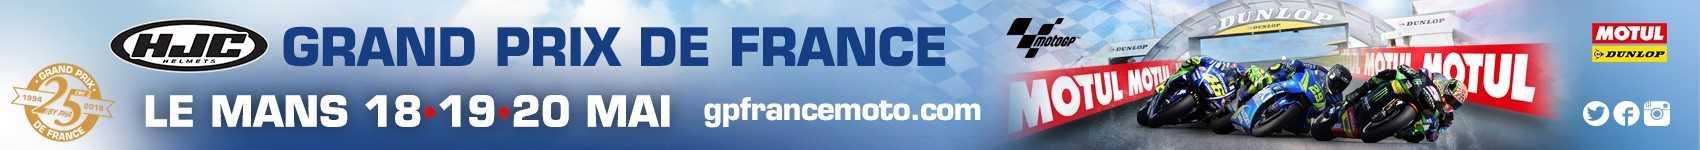 Moto GP France